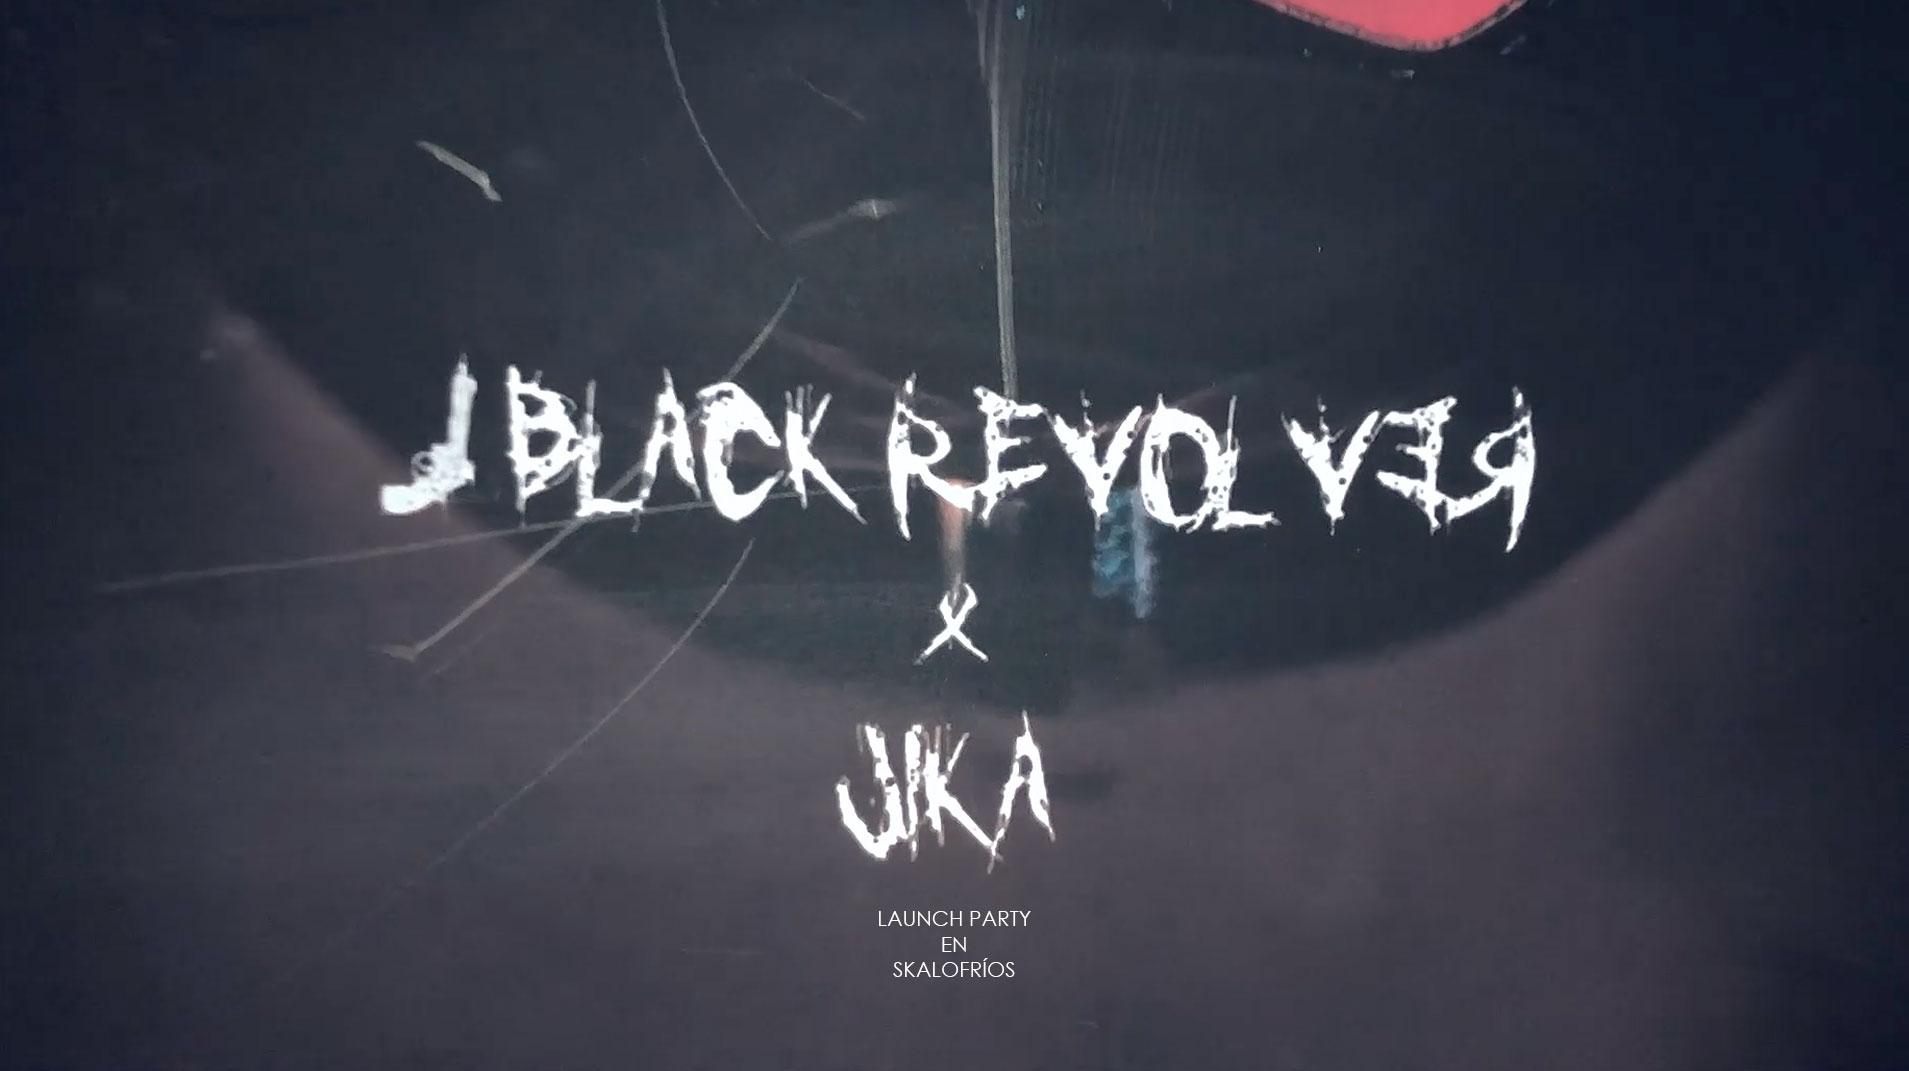 BLACK REVOLVER X JIKA LAUNCH PARTY